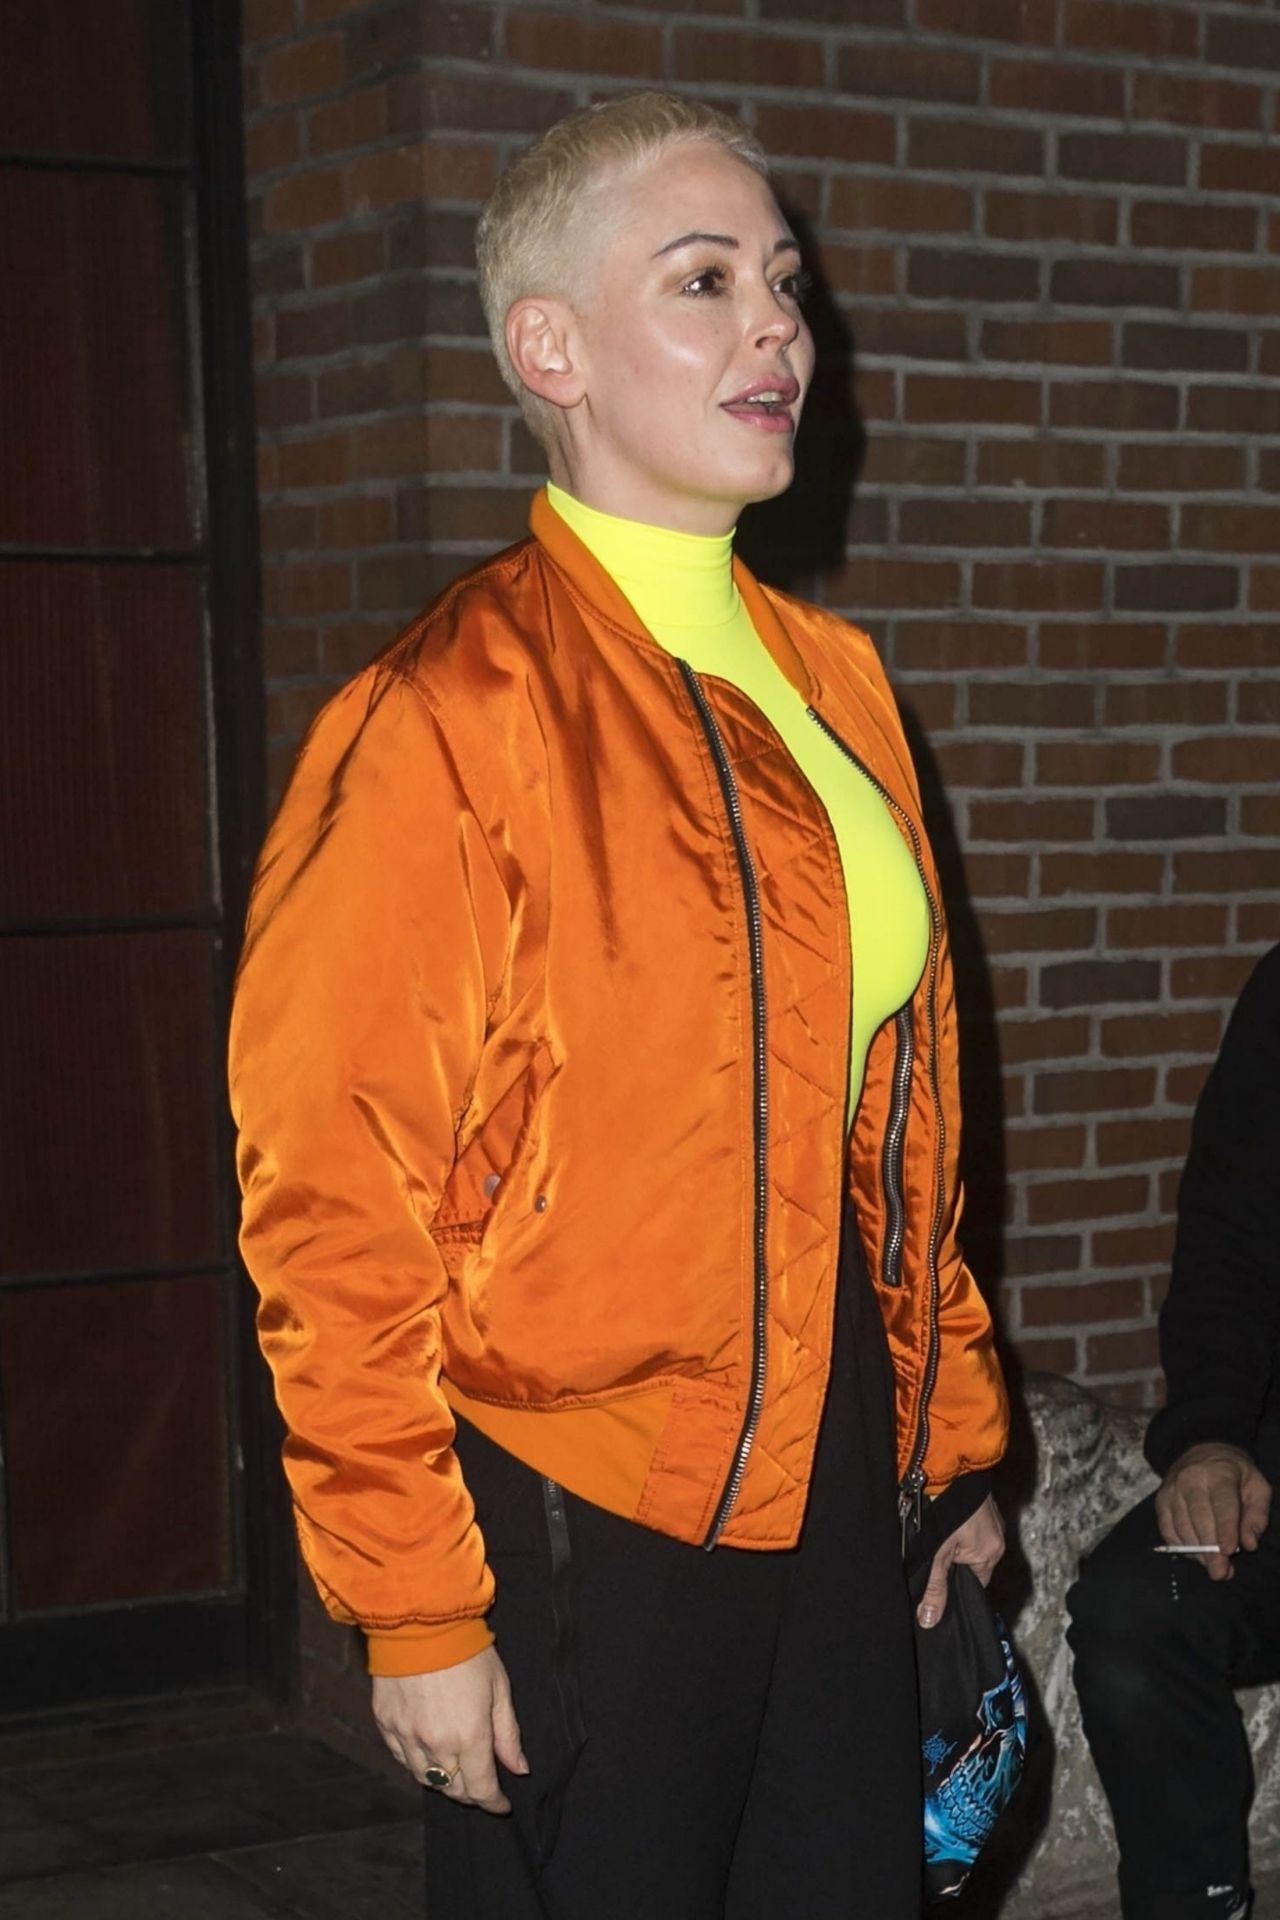 Rose Mcgowan Outside The Bowery Hotel 02 05 2019